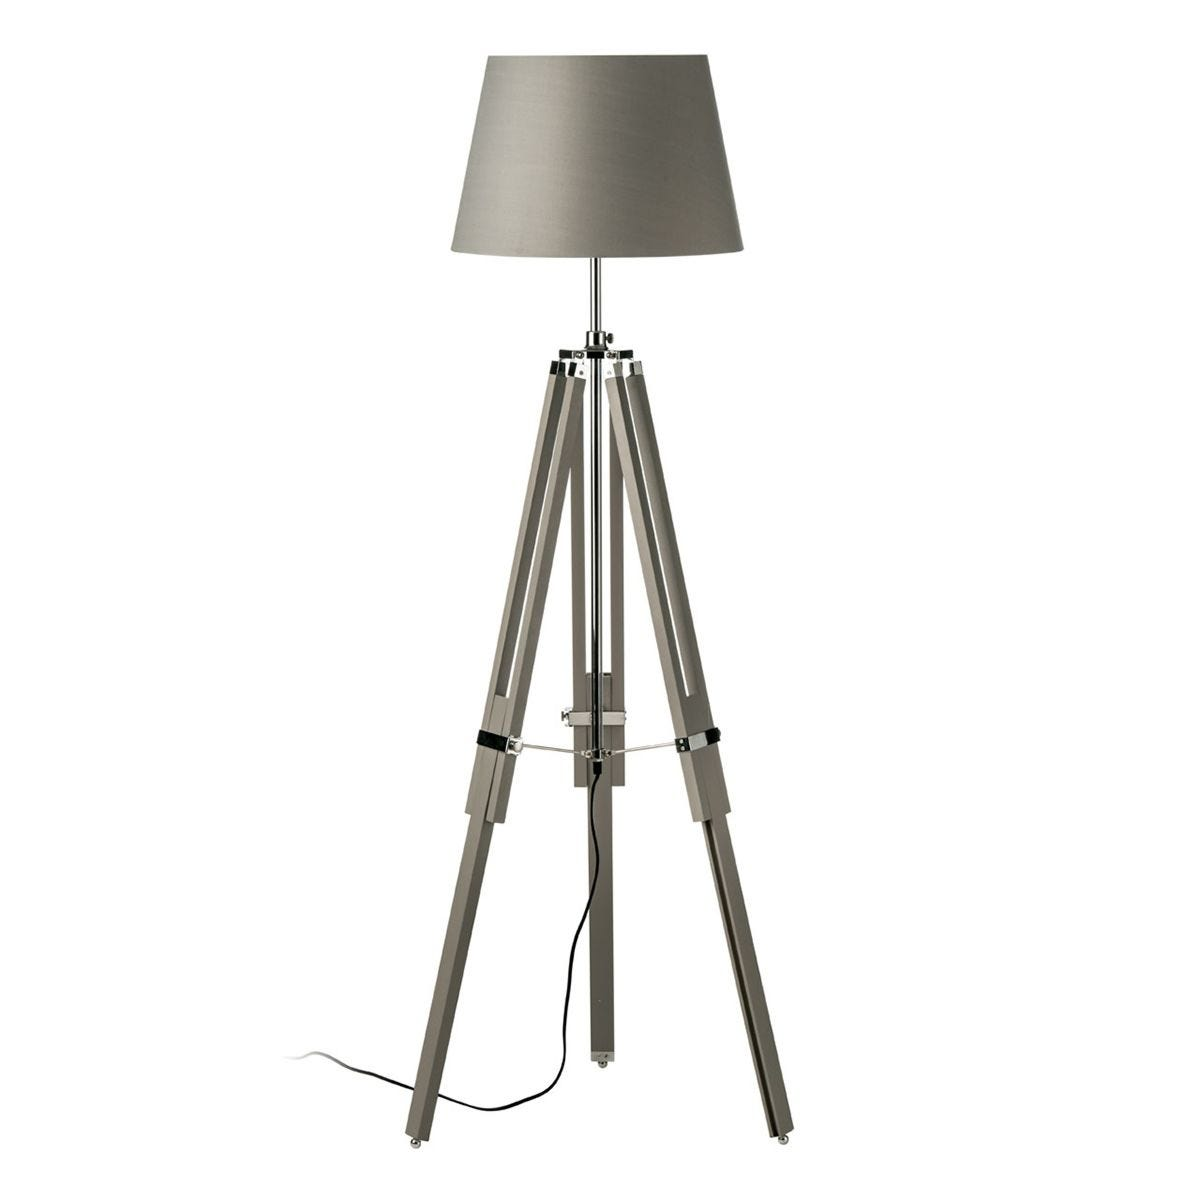 Jasper Floor Lamp Tripod Base - Grey